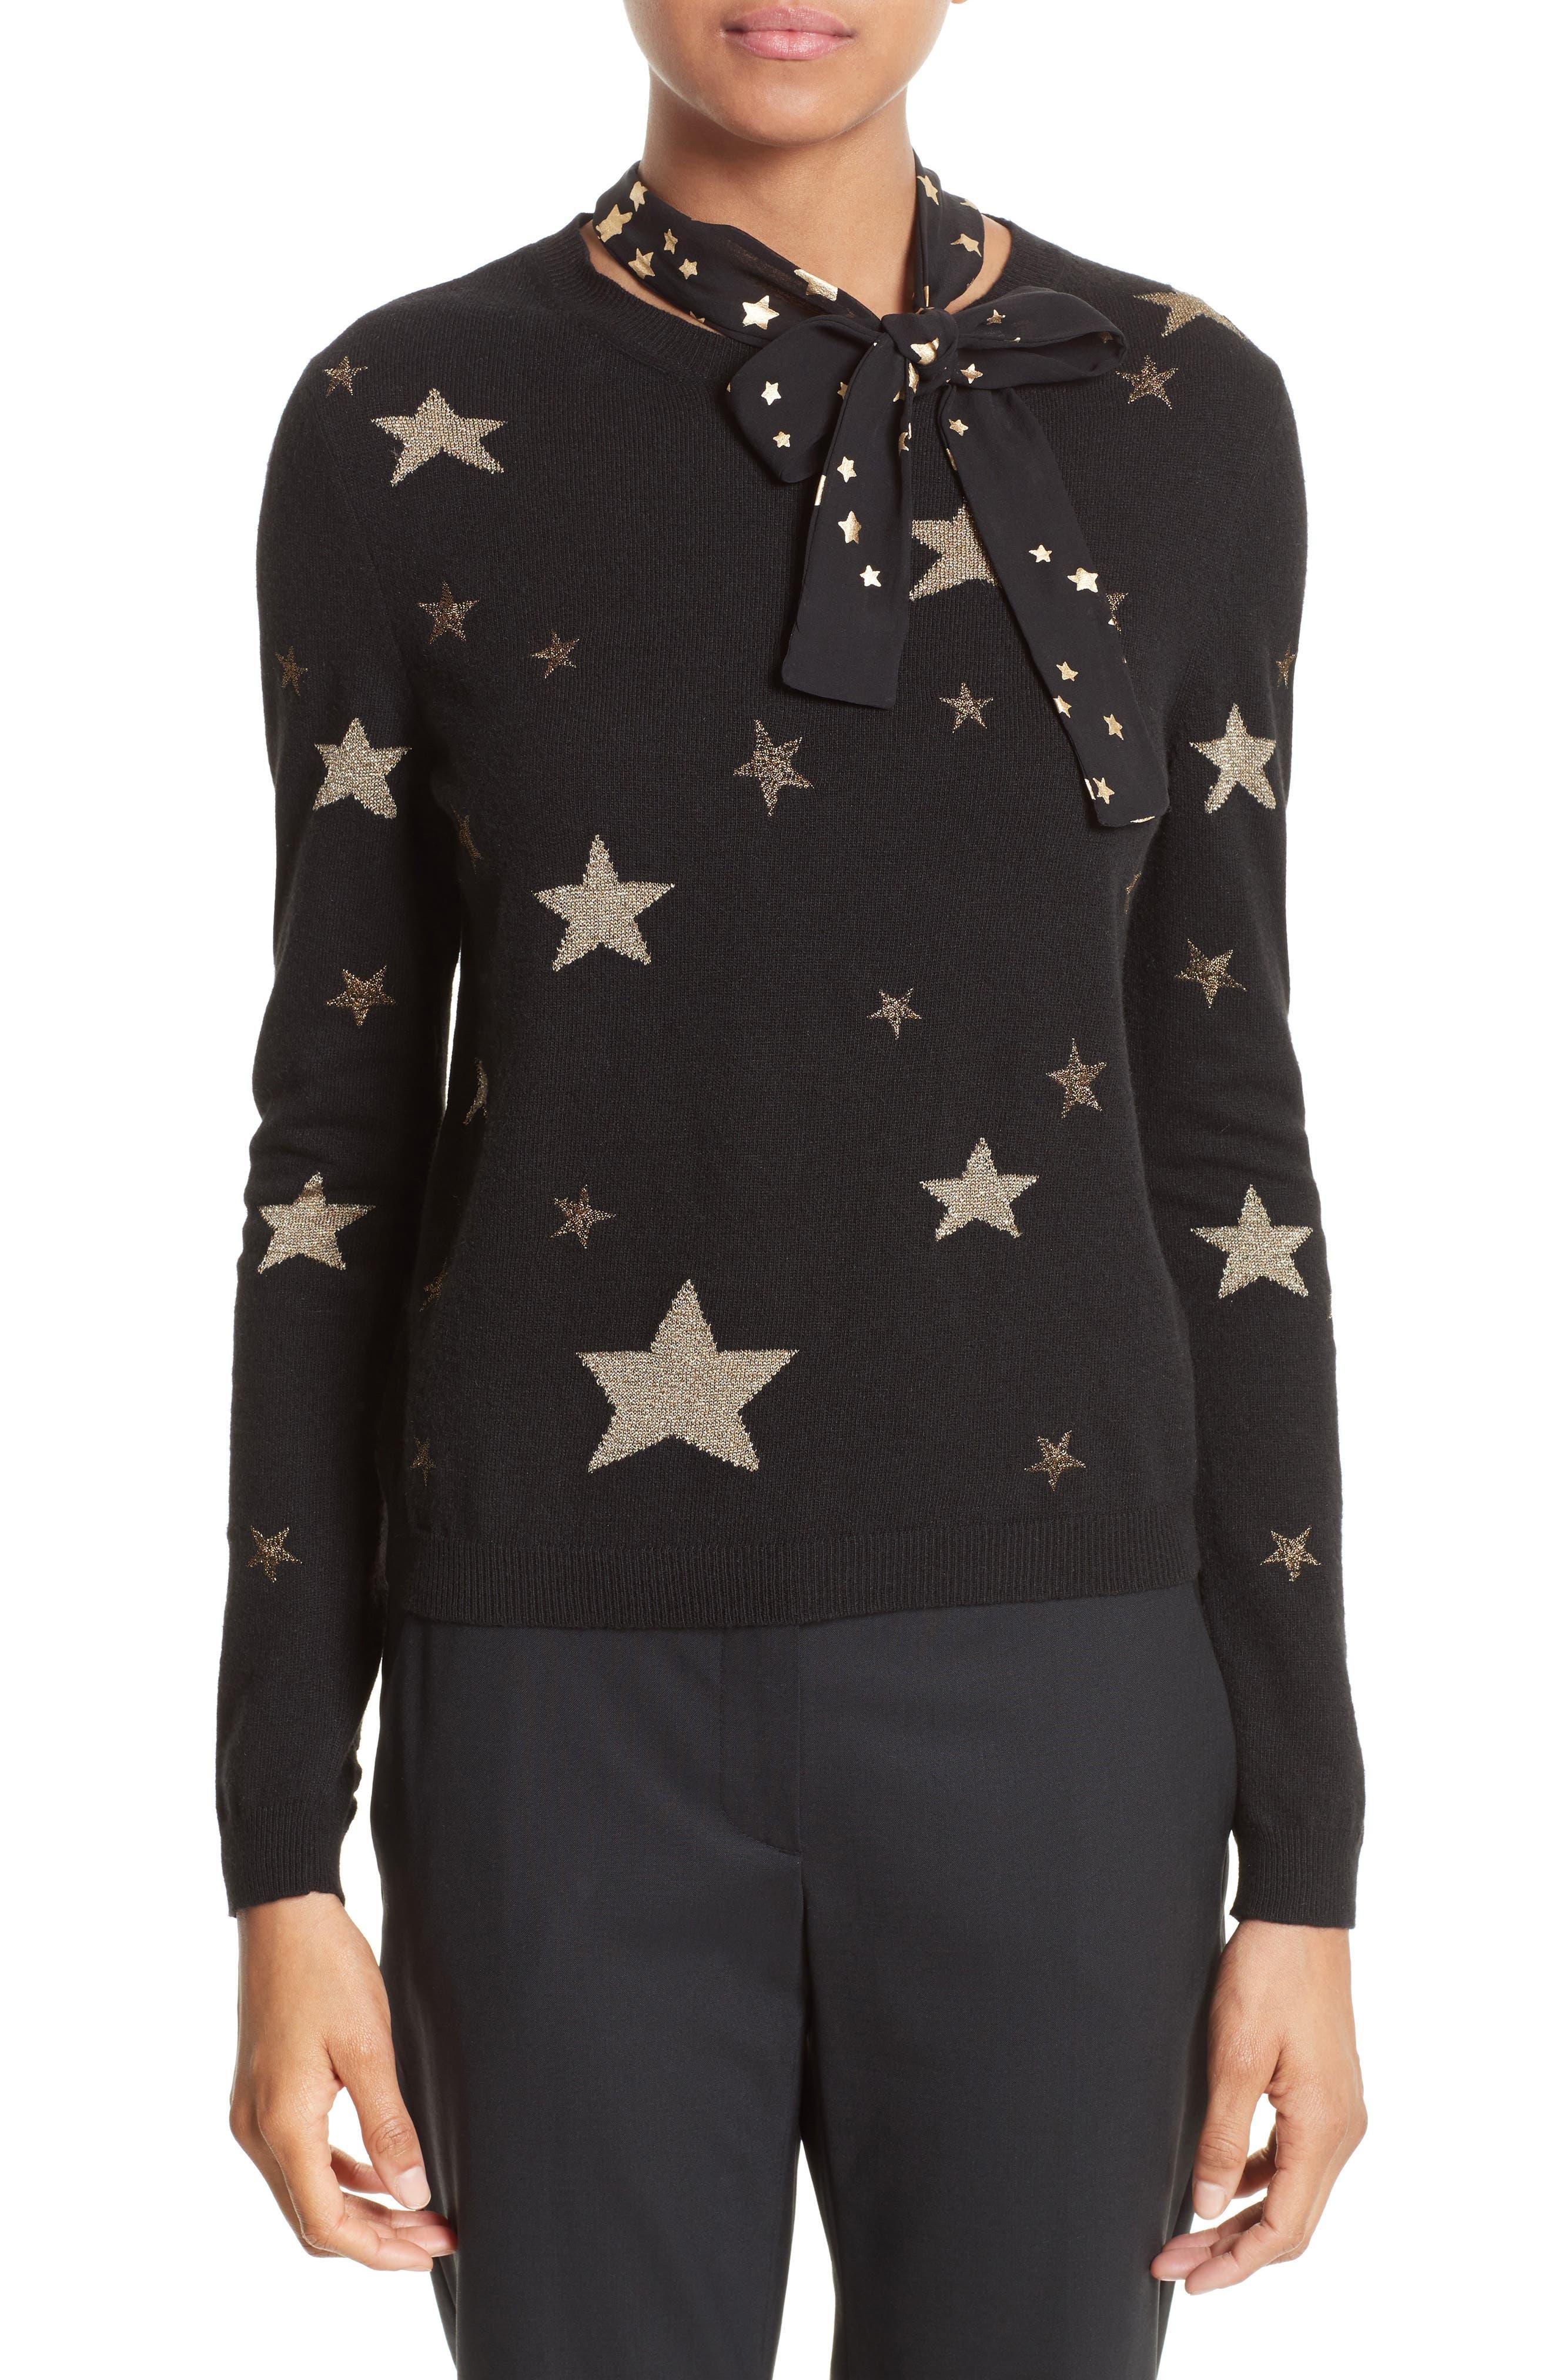 RED Valentino Tie Neck Star Sweater